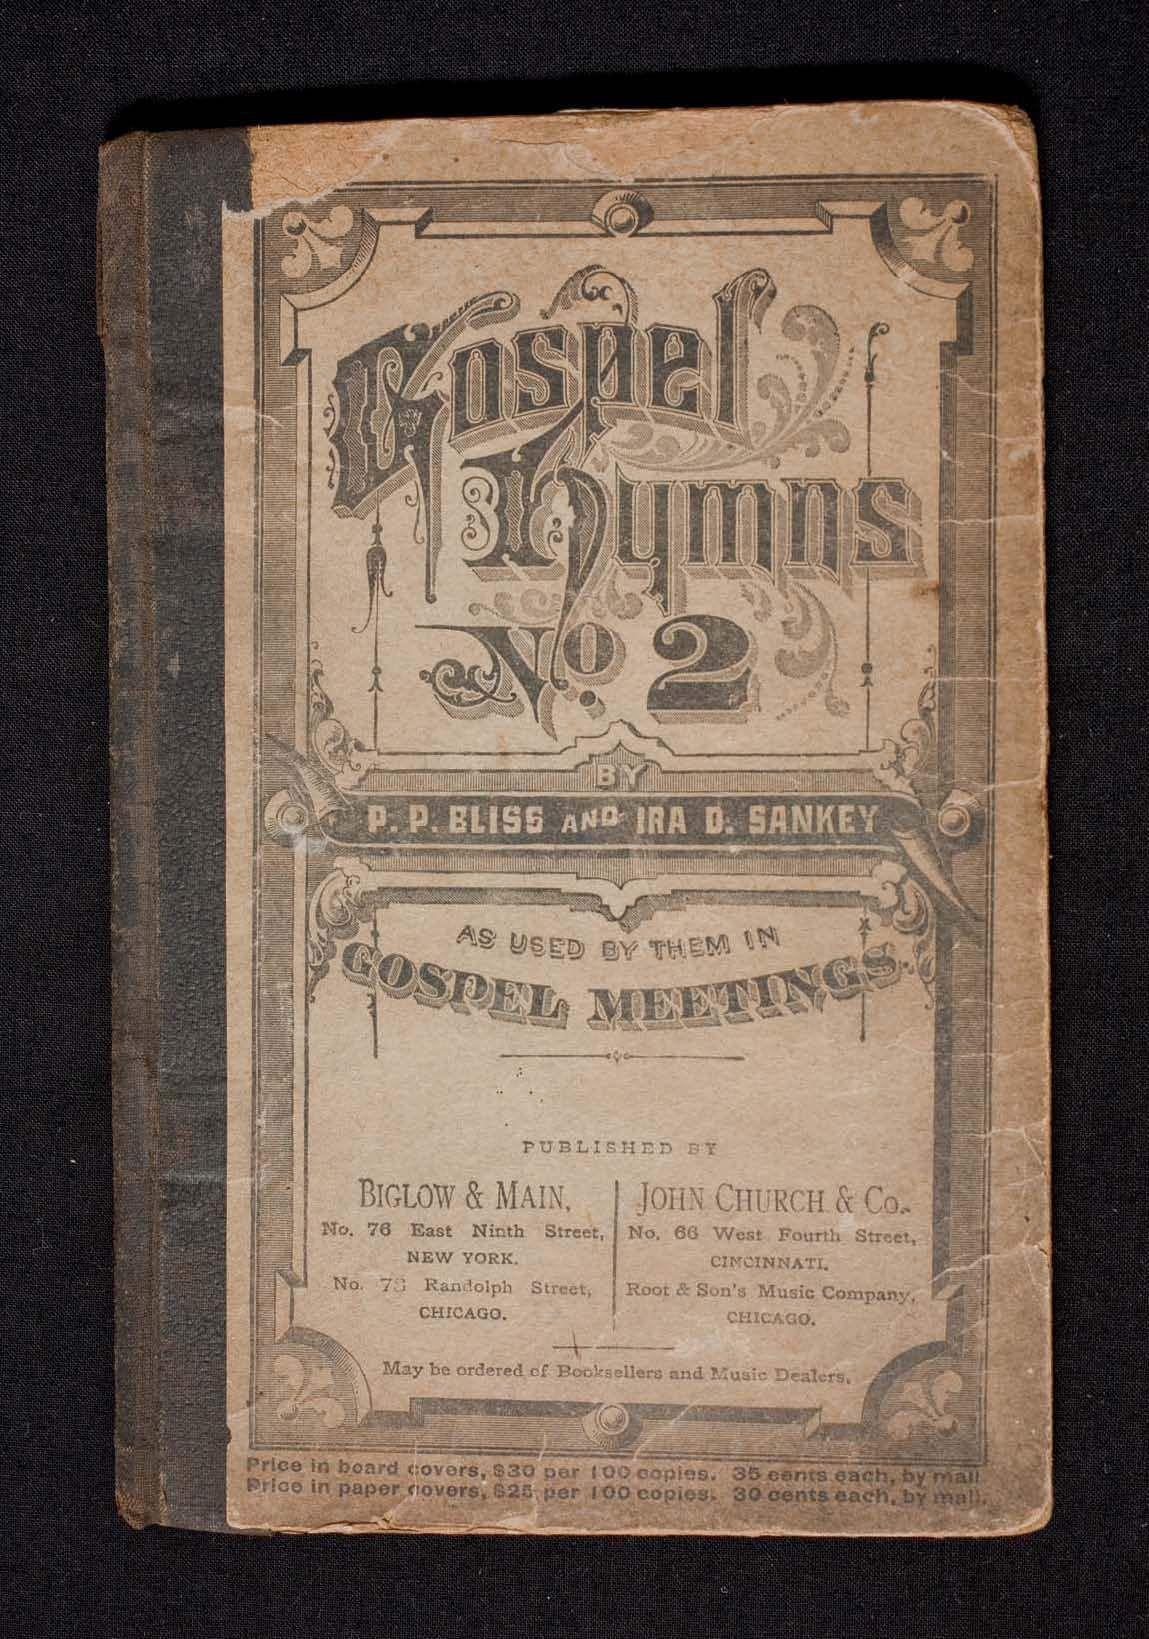 Tubman Hymnal.jpg 1,149×1,639 pixels | Posters and Prints ...